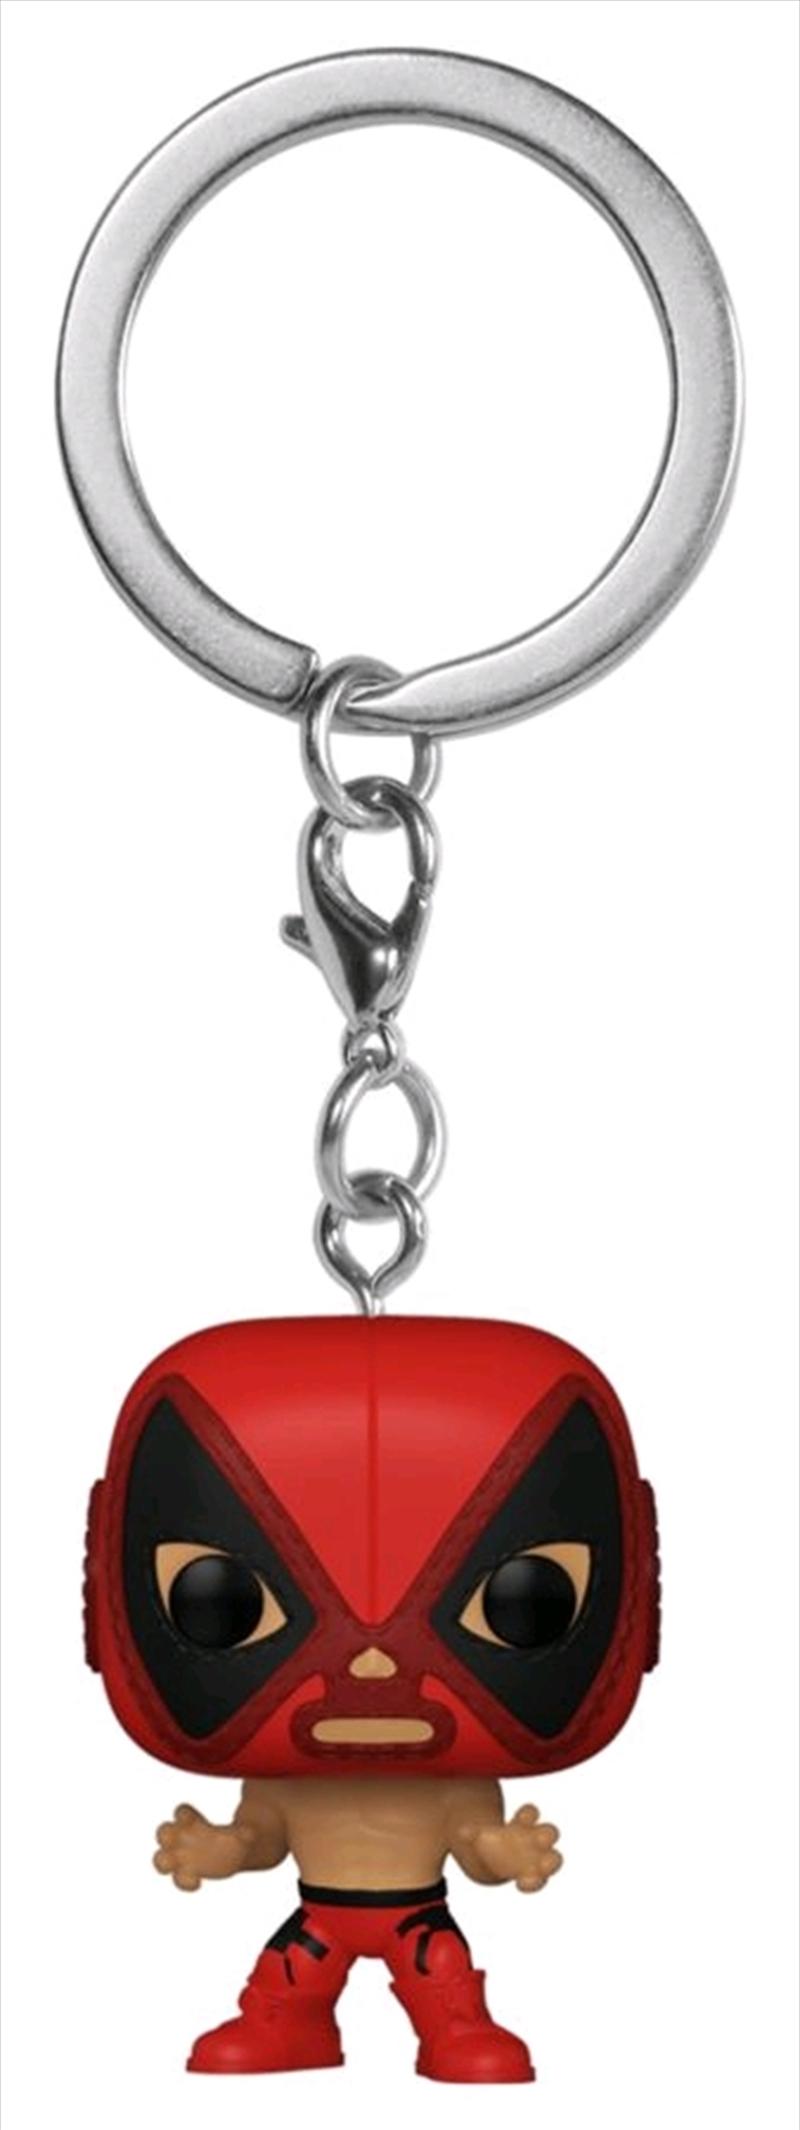 Deadpool - Luchadore Deadpool Pocket Pop! Keychain | Pop Vinyl